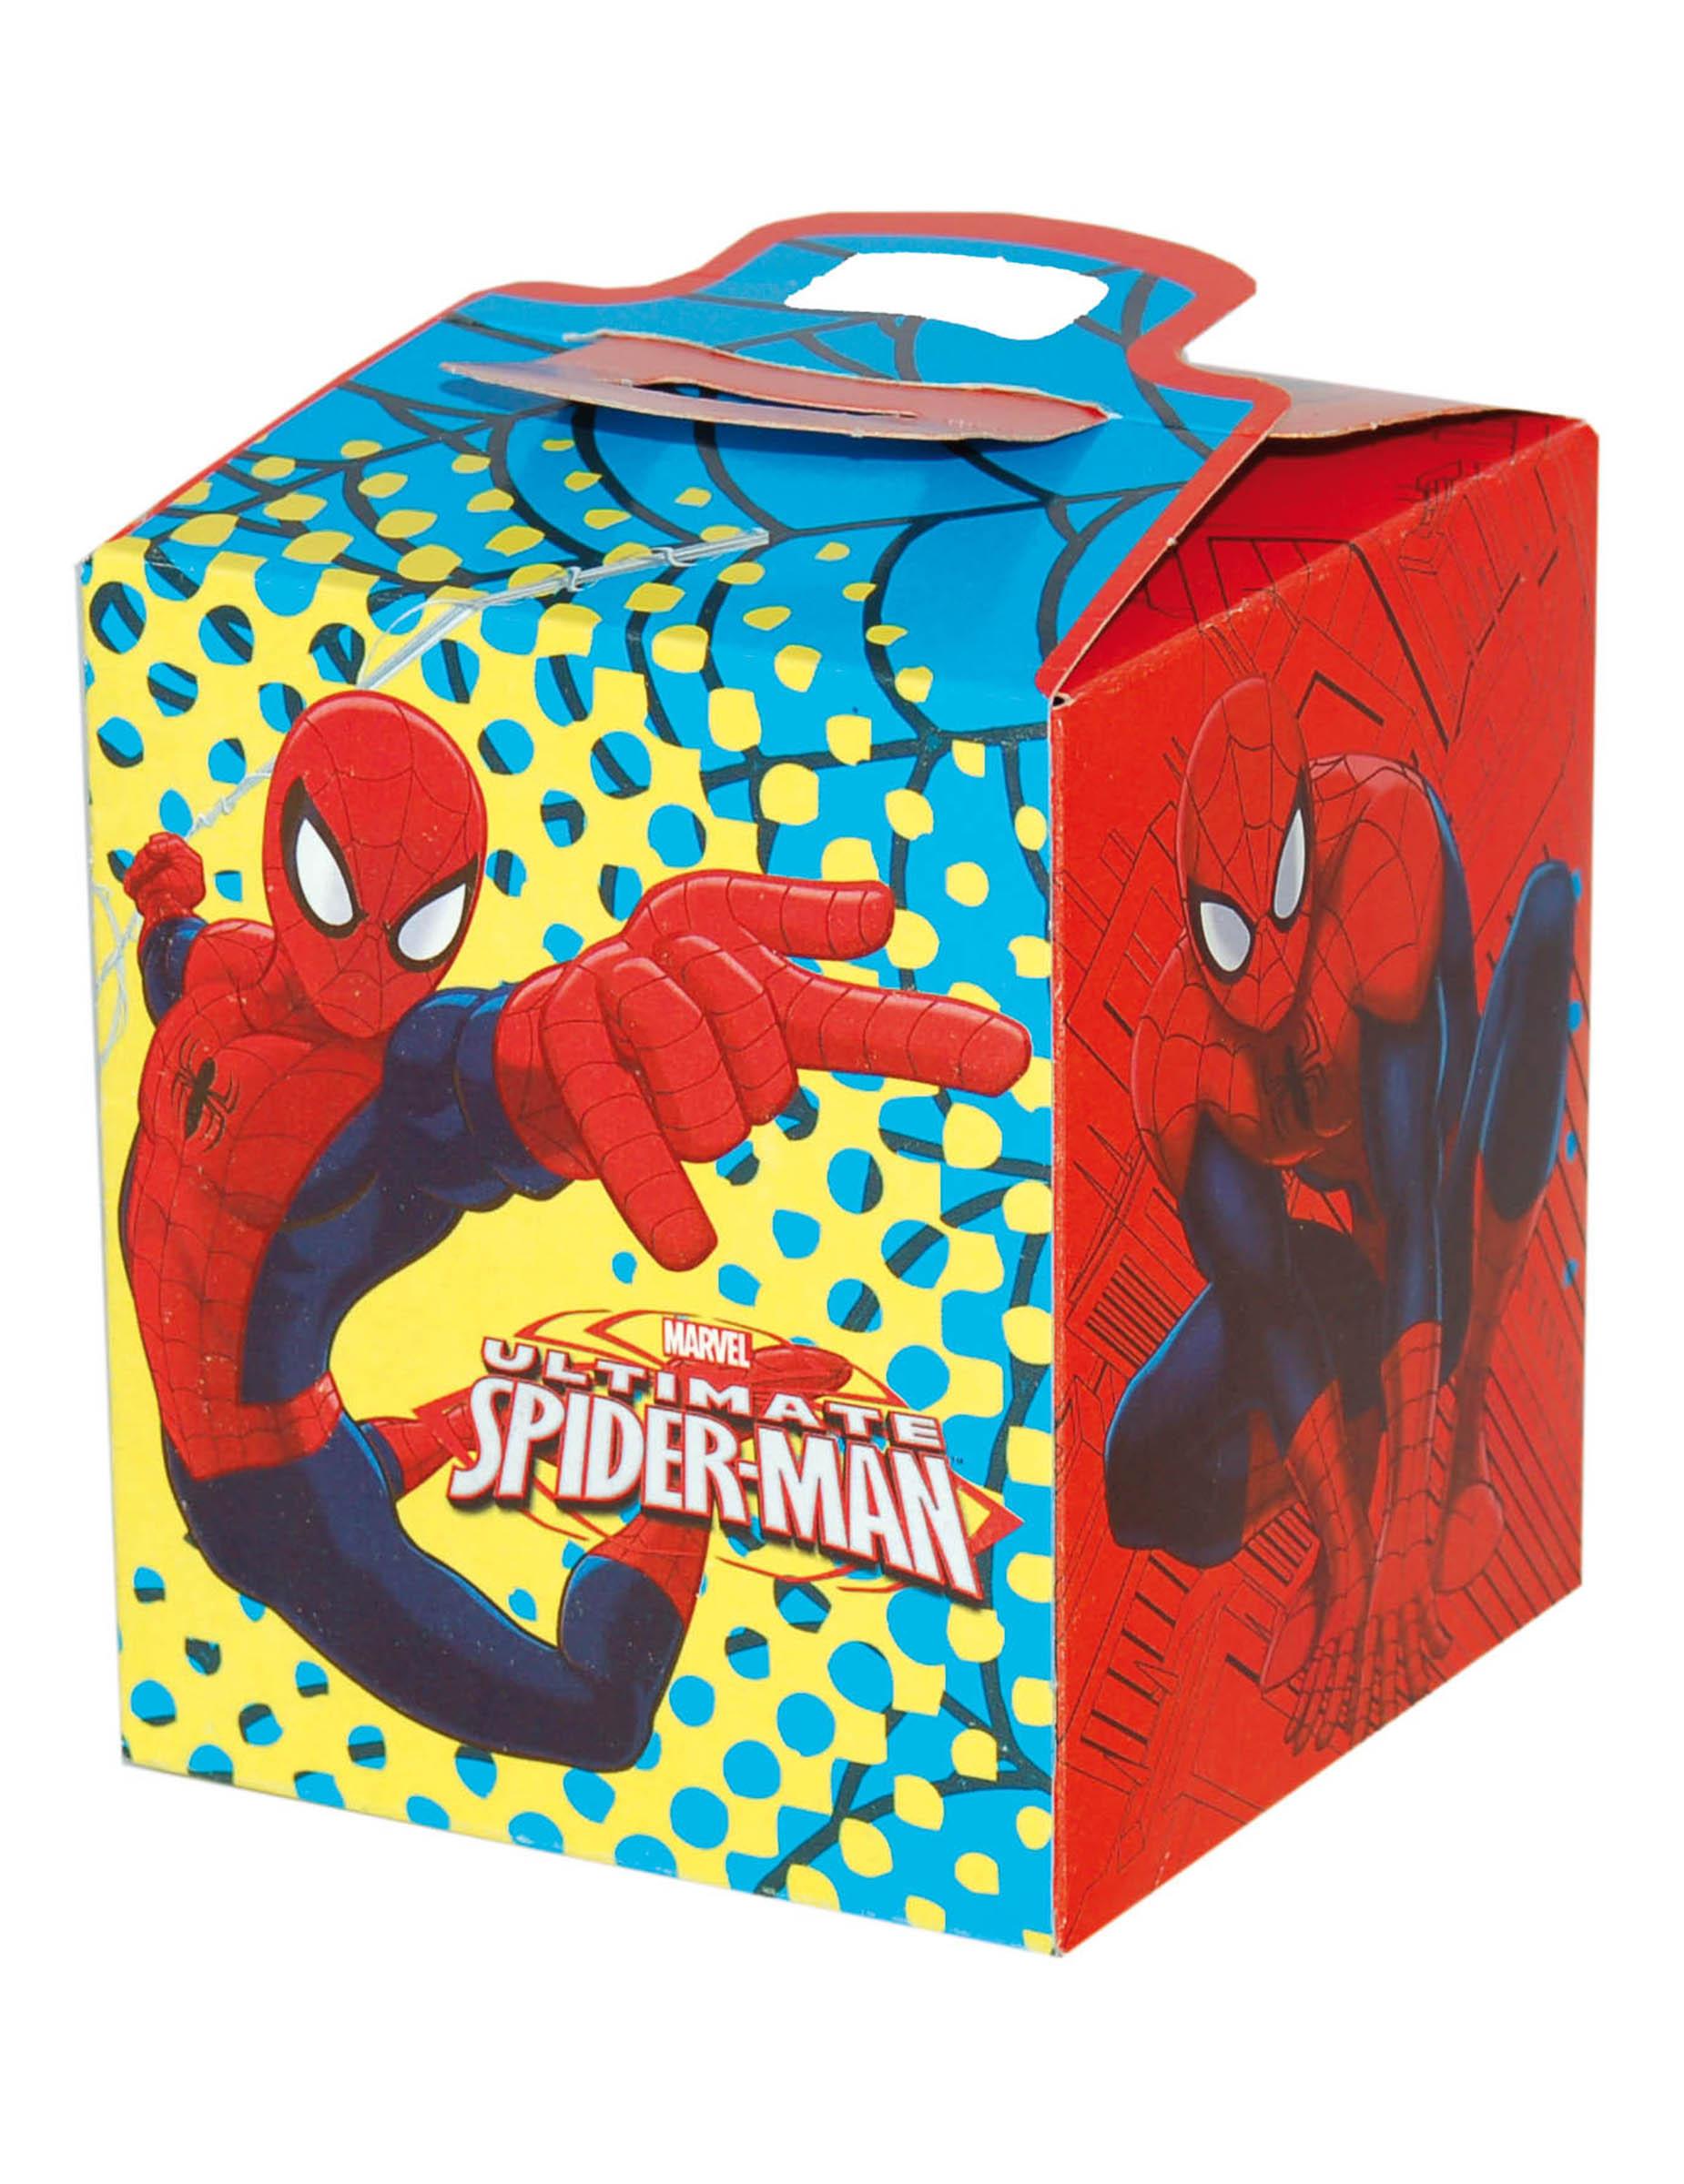 spiderman geschenkbox rot blau gelb partydeko und g nstige faschingskost me vegaoo. Black Bedroom Furniture Sets. Home Design Ideas